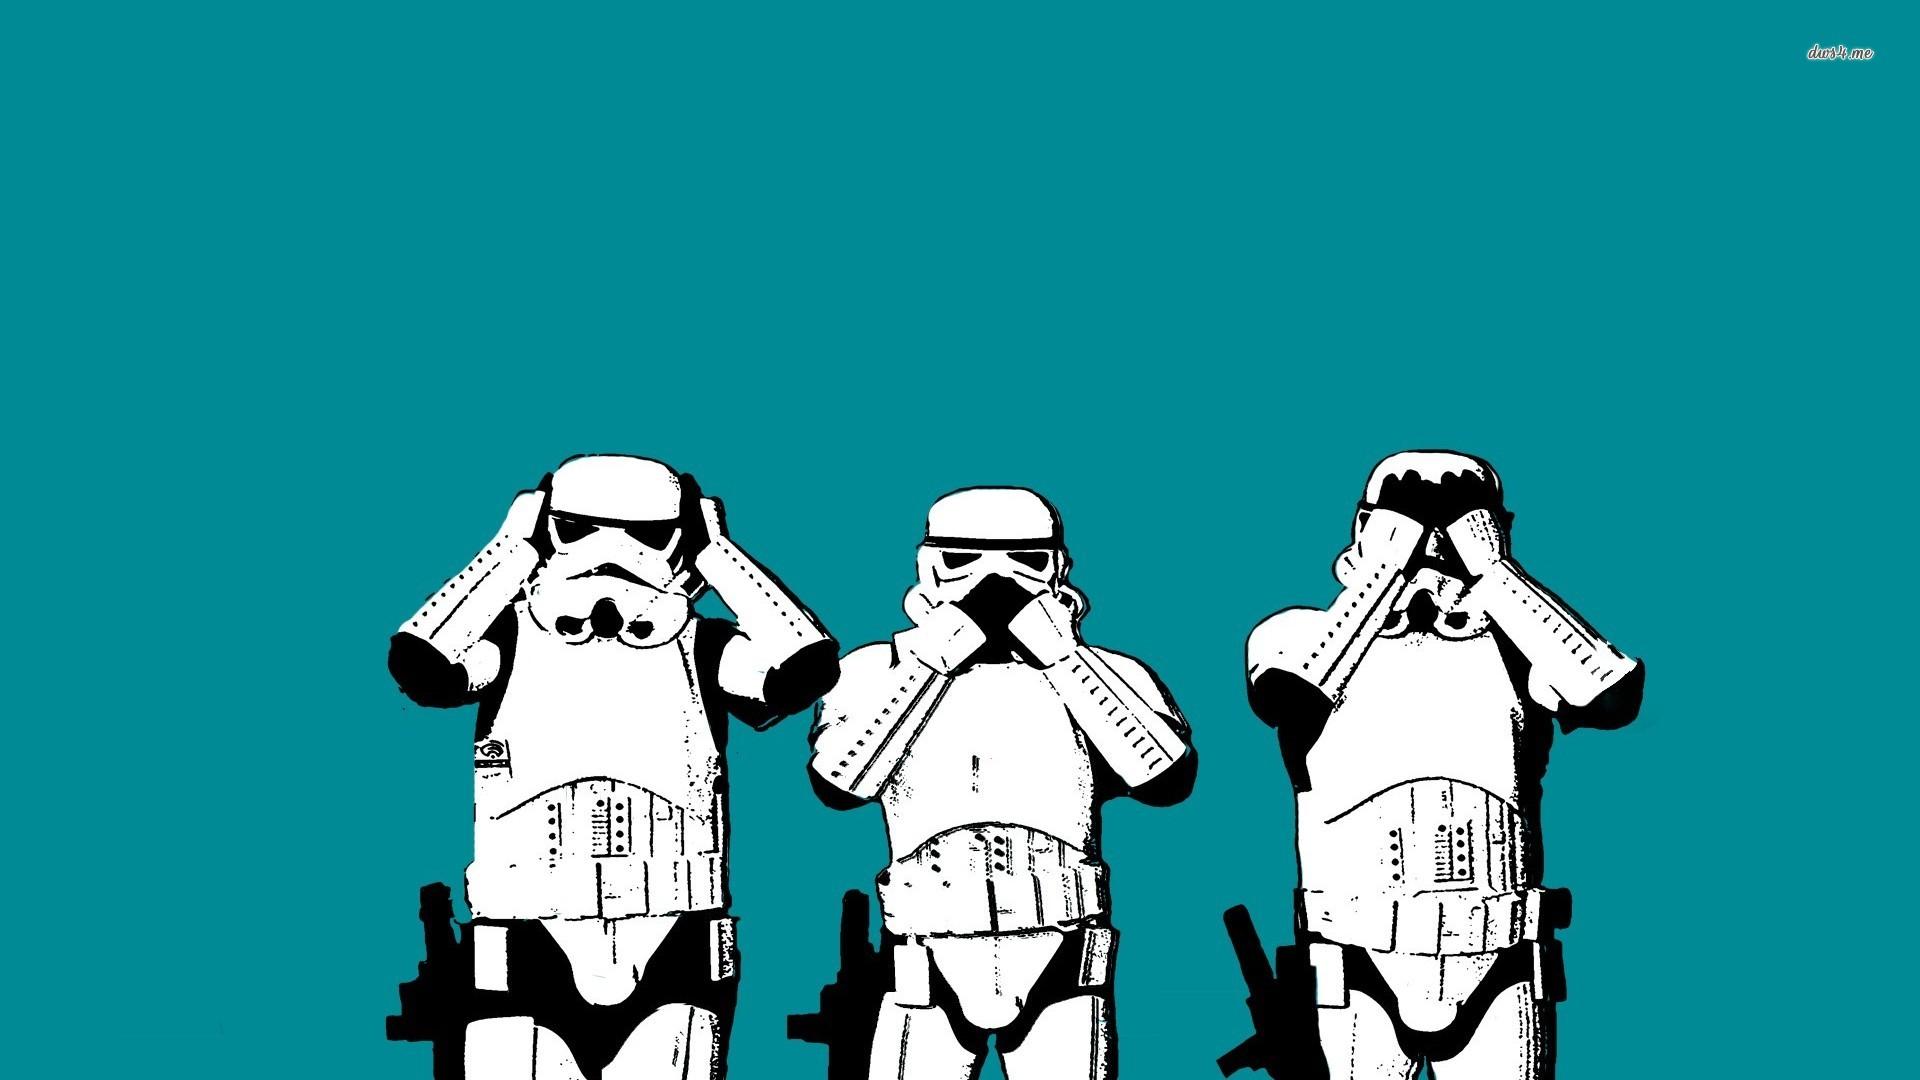 stormtrooper wallpaper art 1920 1080 star wars